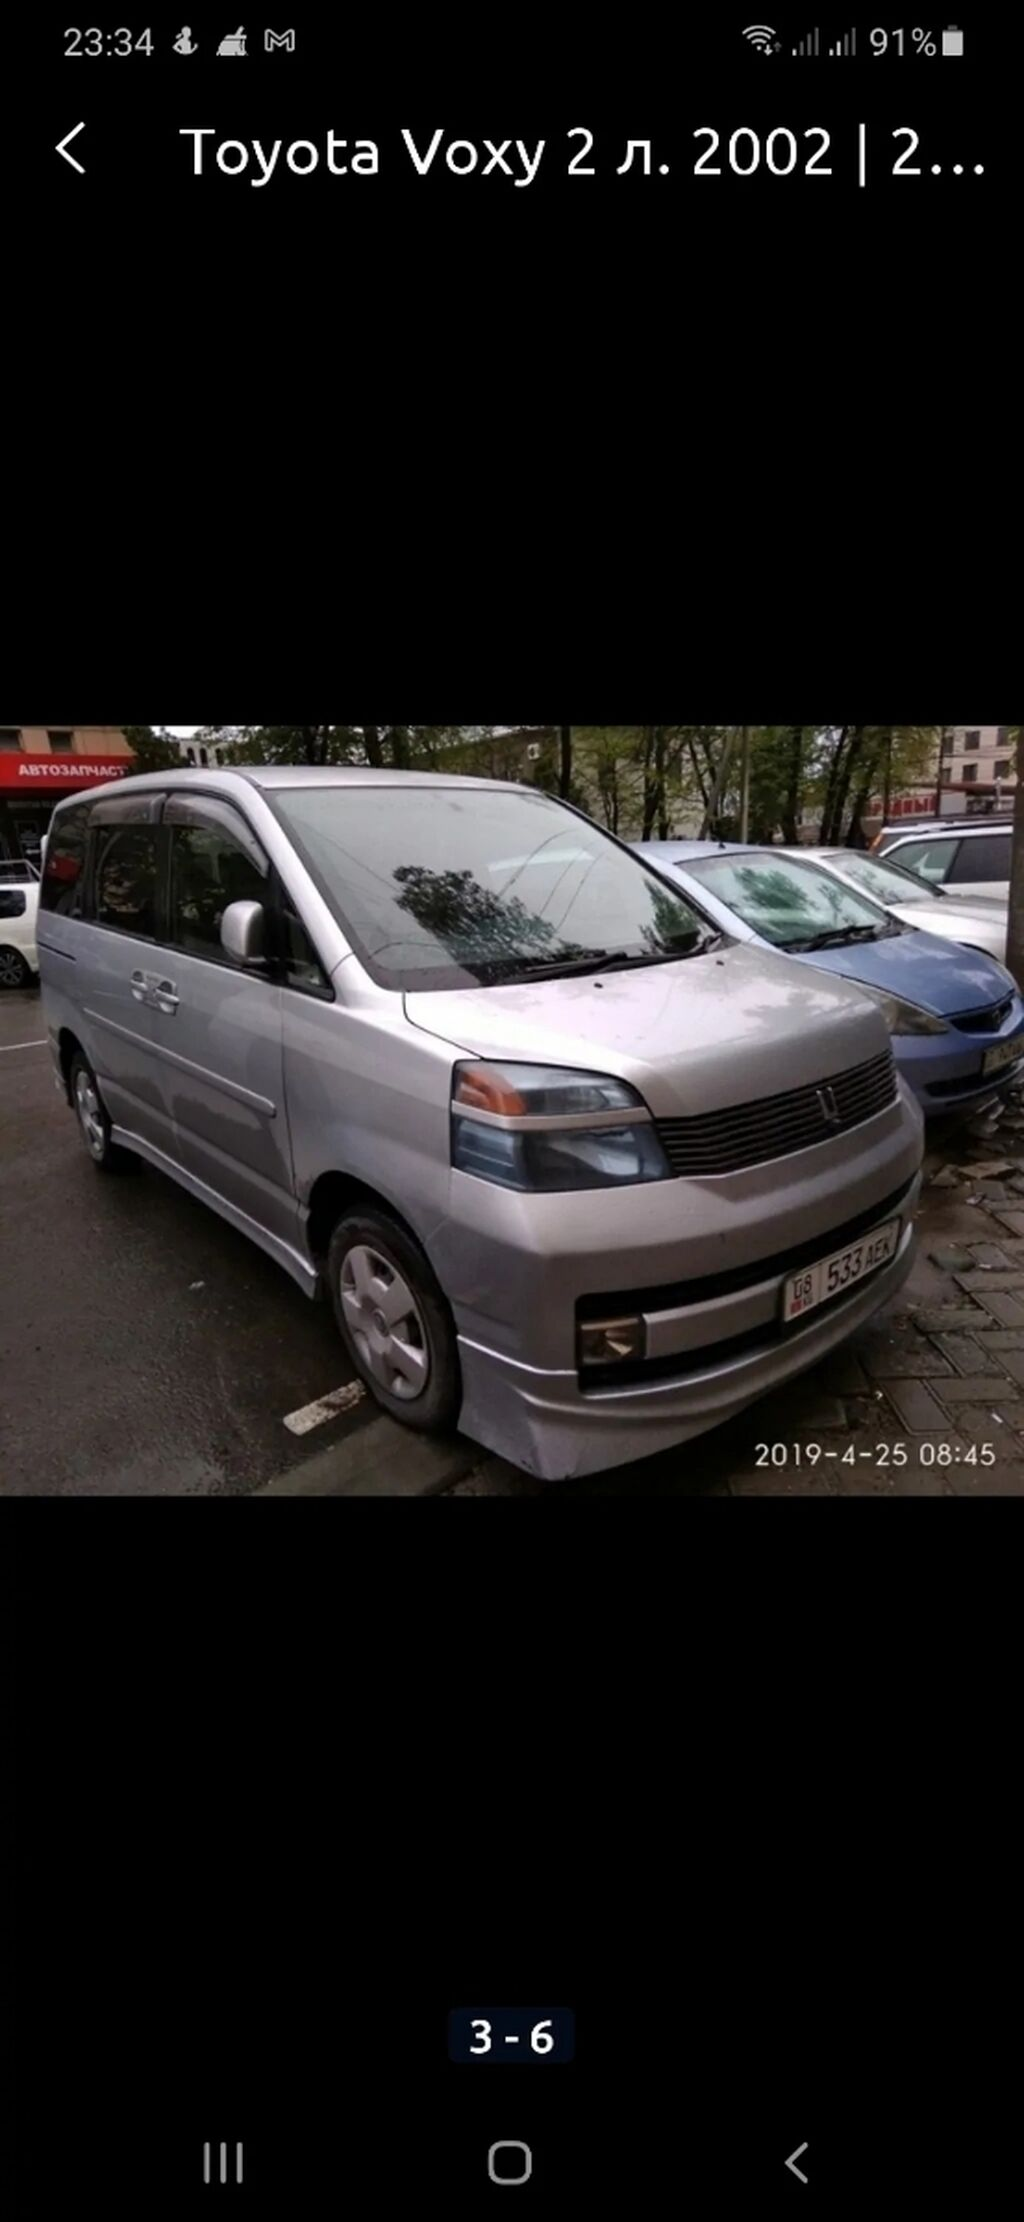 Toyota Voxy 2 л. 2002 | 220000 км: Toyota Voxy 2 л. 2002 | 220000 км